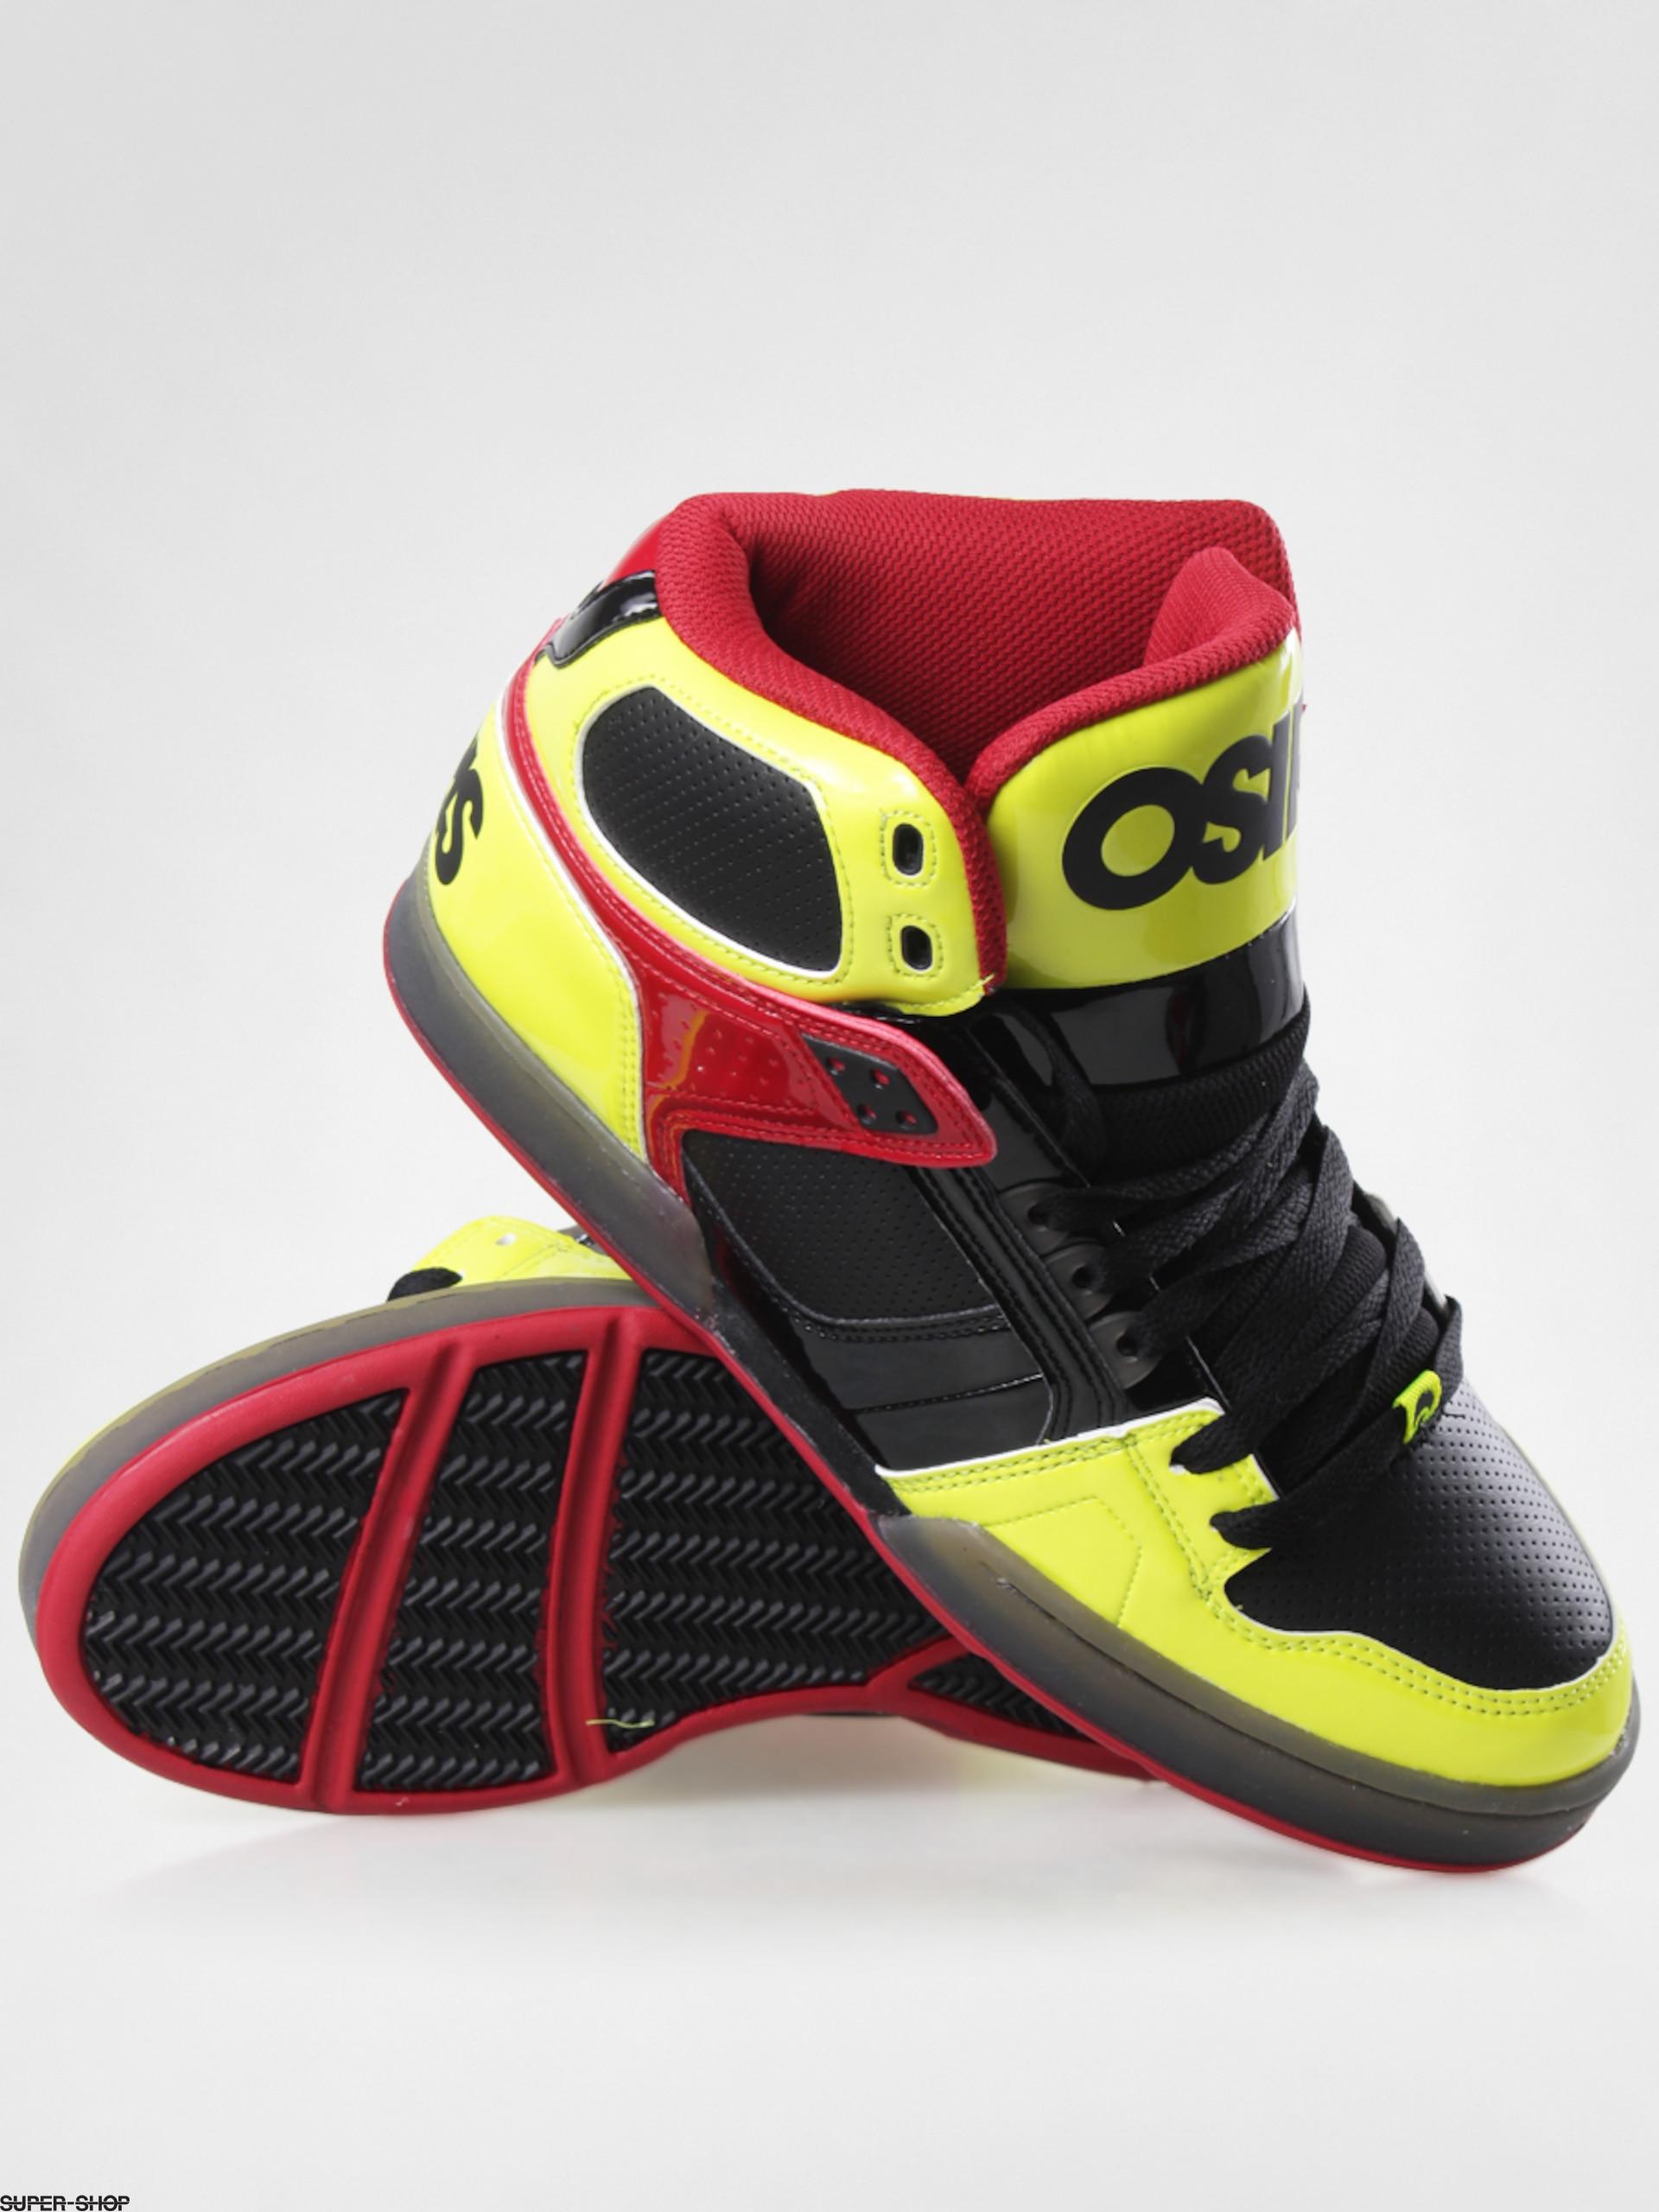 Osiris shoes NYC 83 (yellow/black/red)